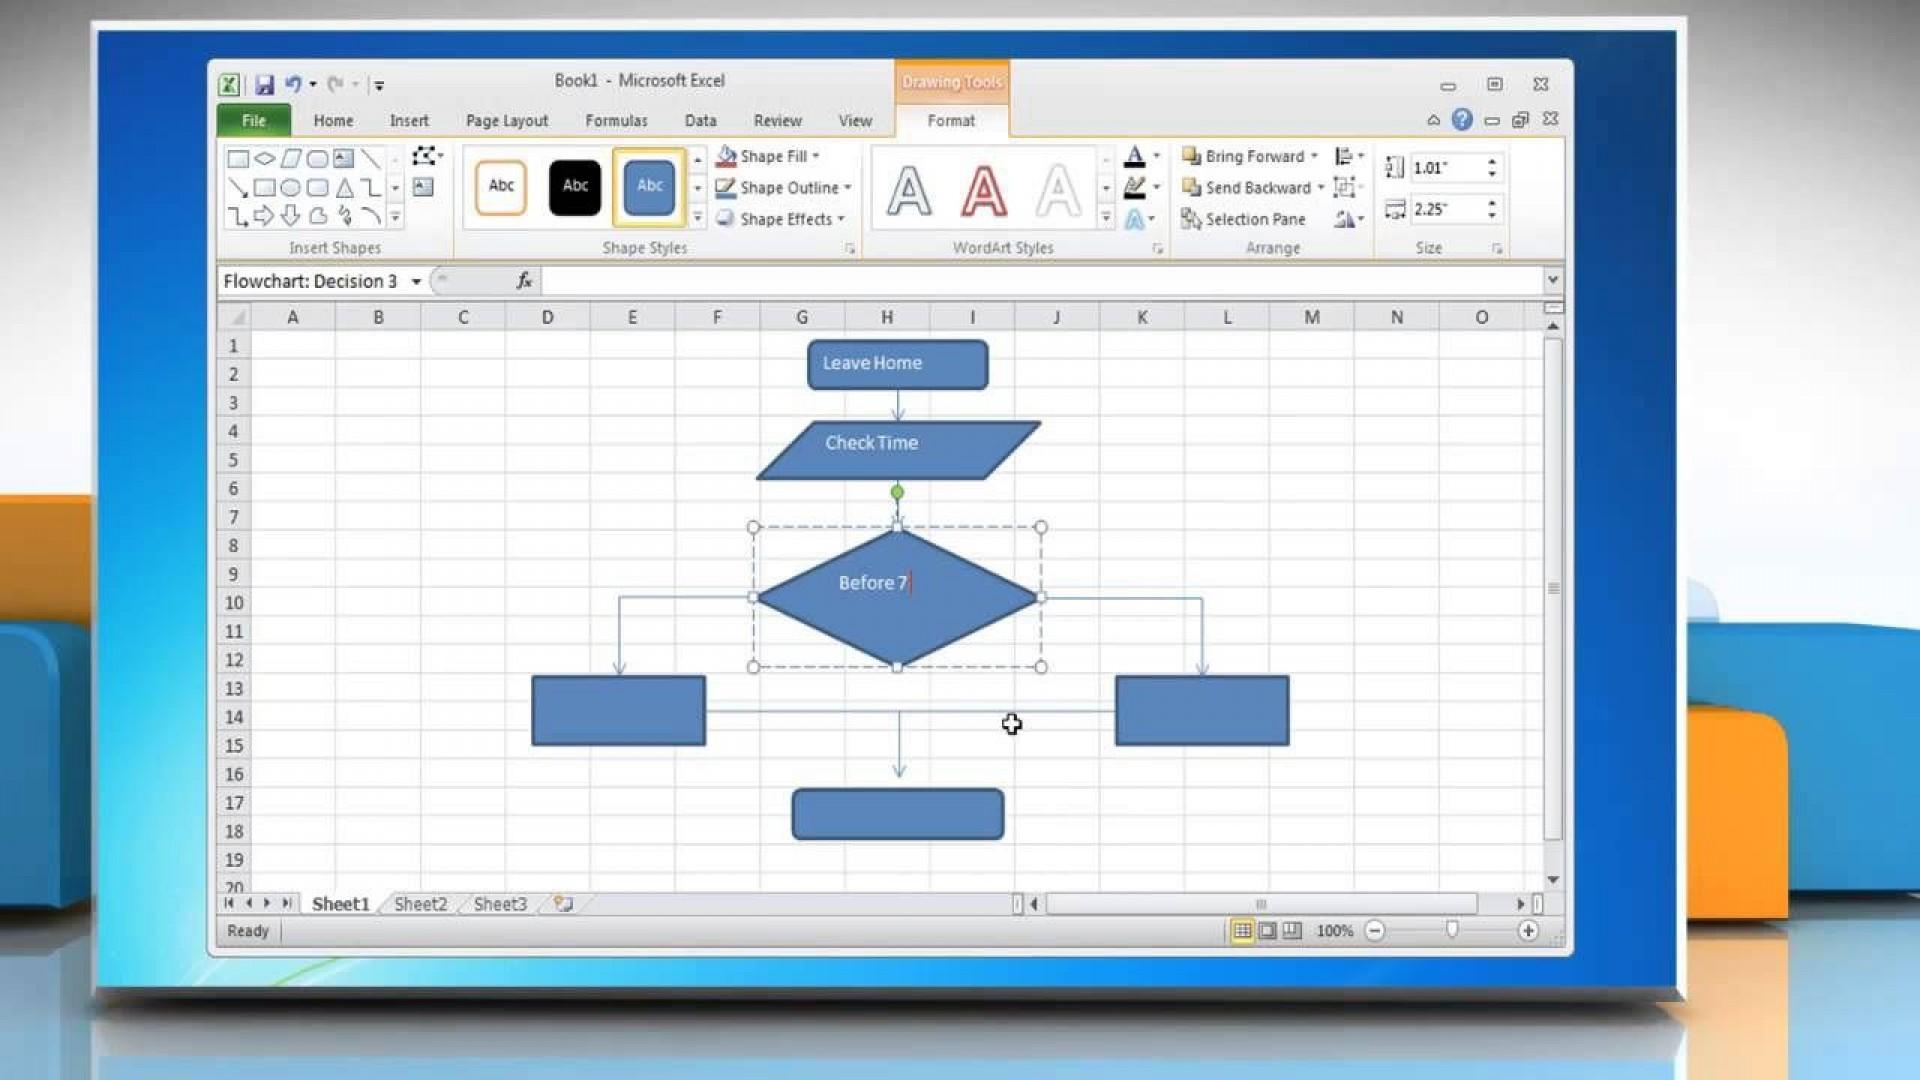 009 Surprising Flow Chart Microsoft Excel High Resolution  Flowchart Template1920